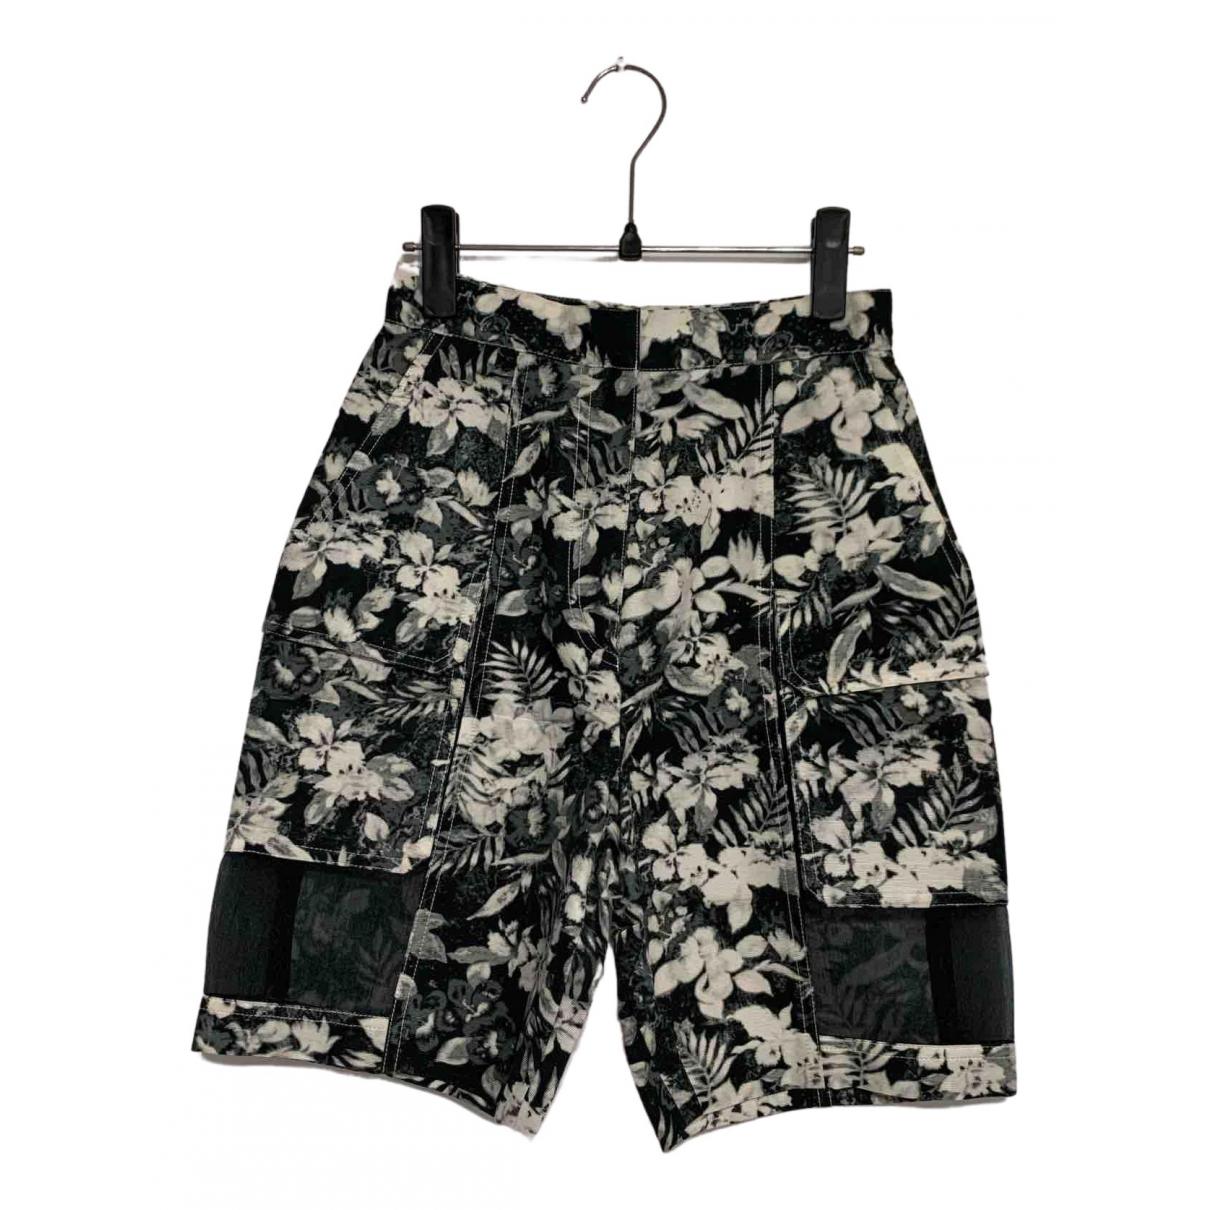 Pantalon corto Alexander Wang